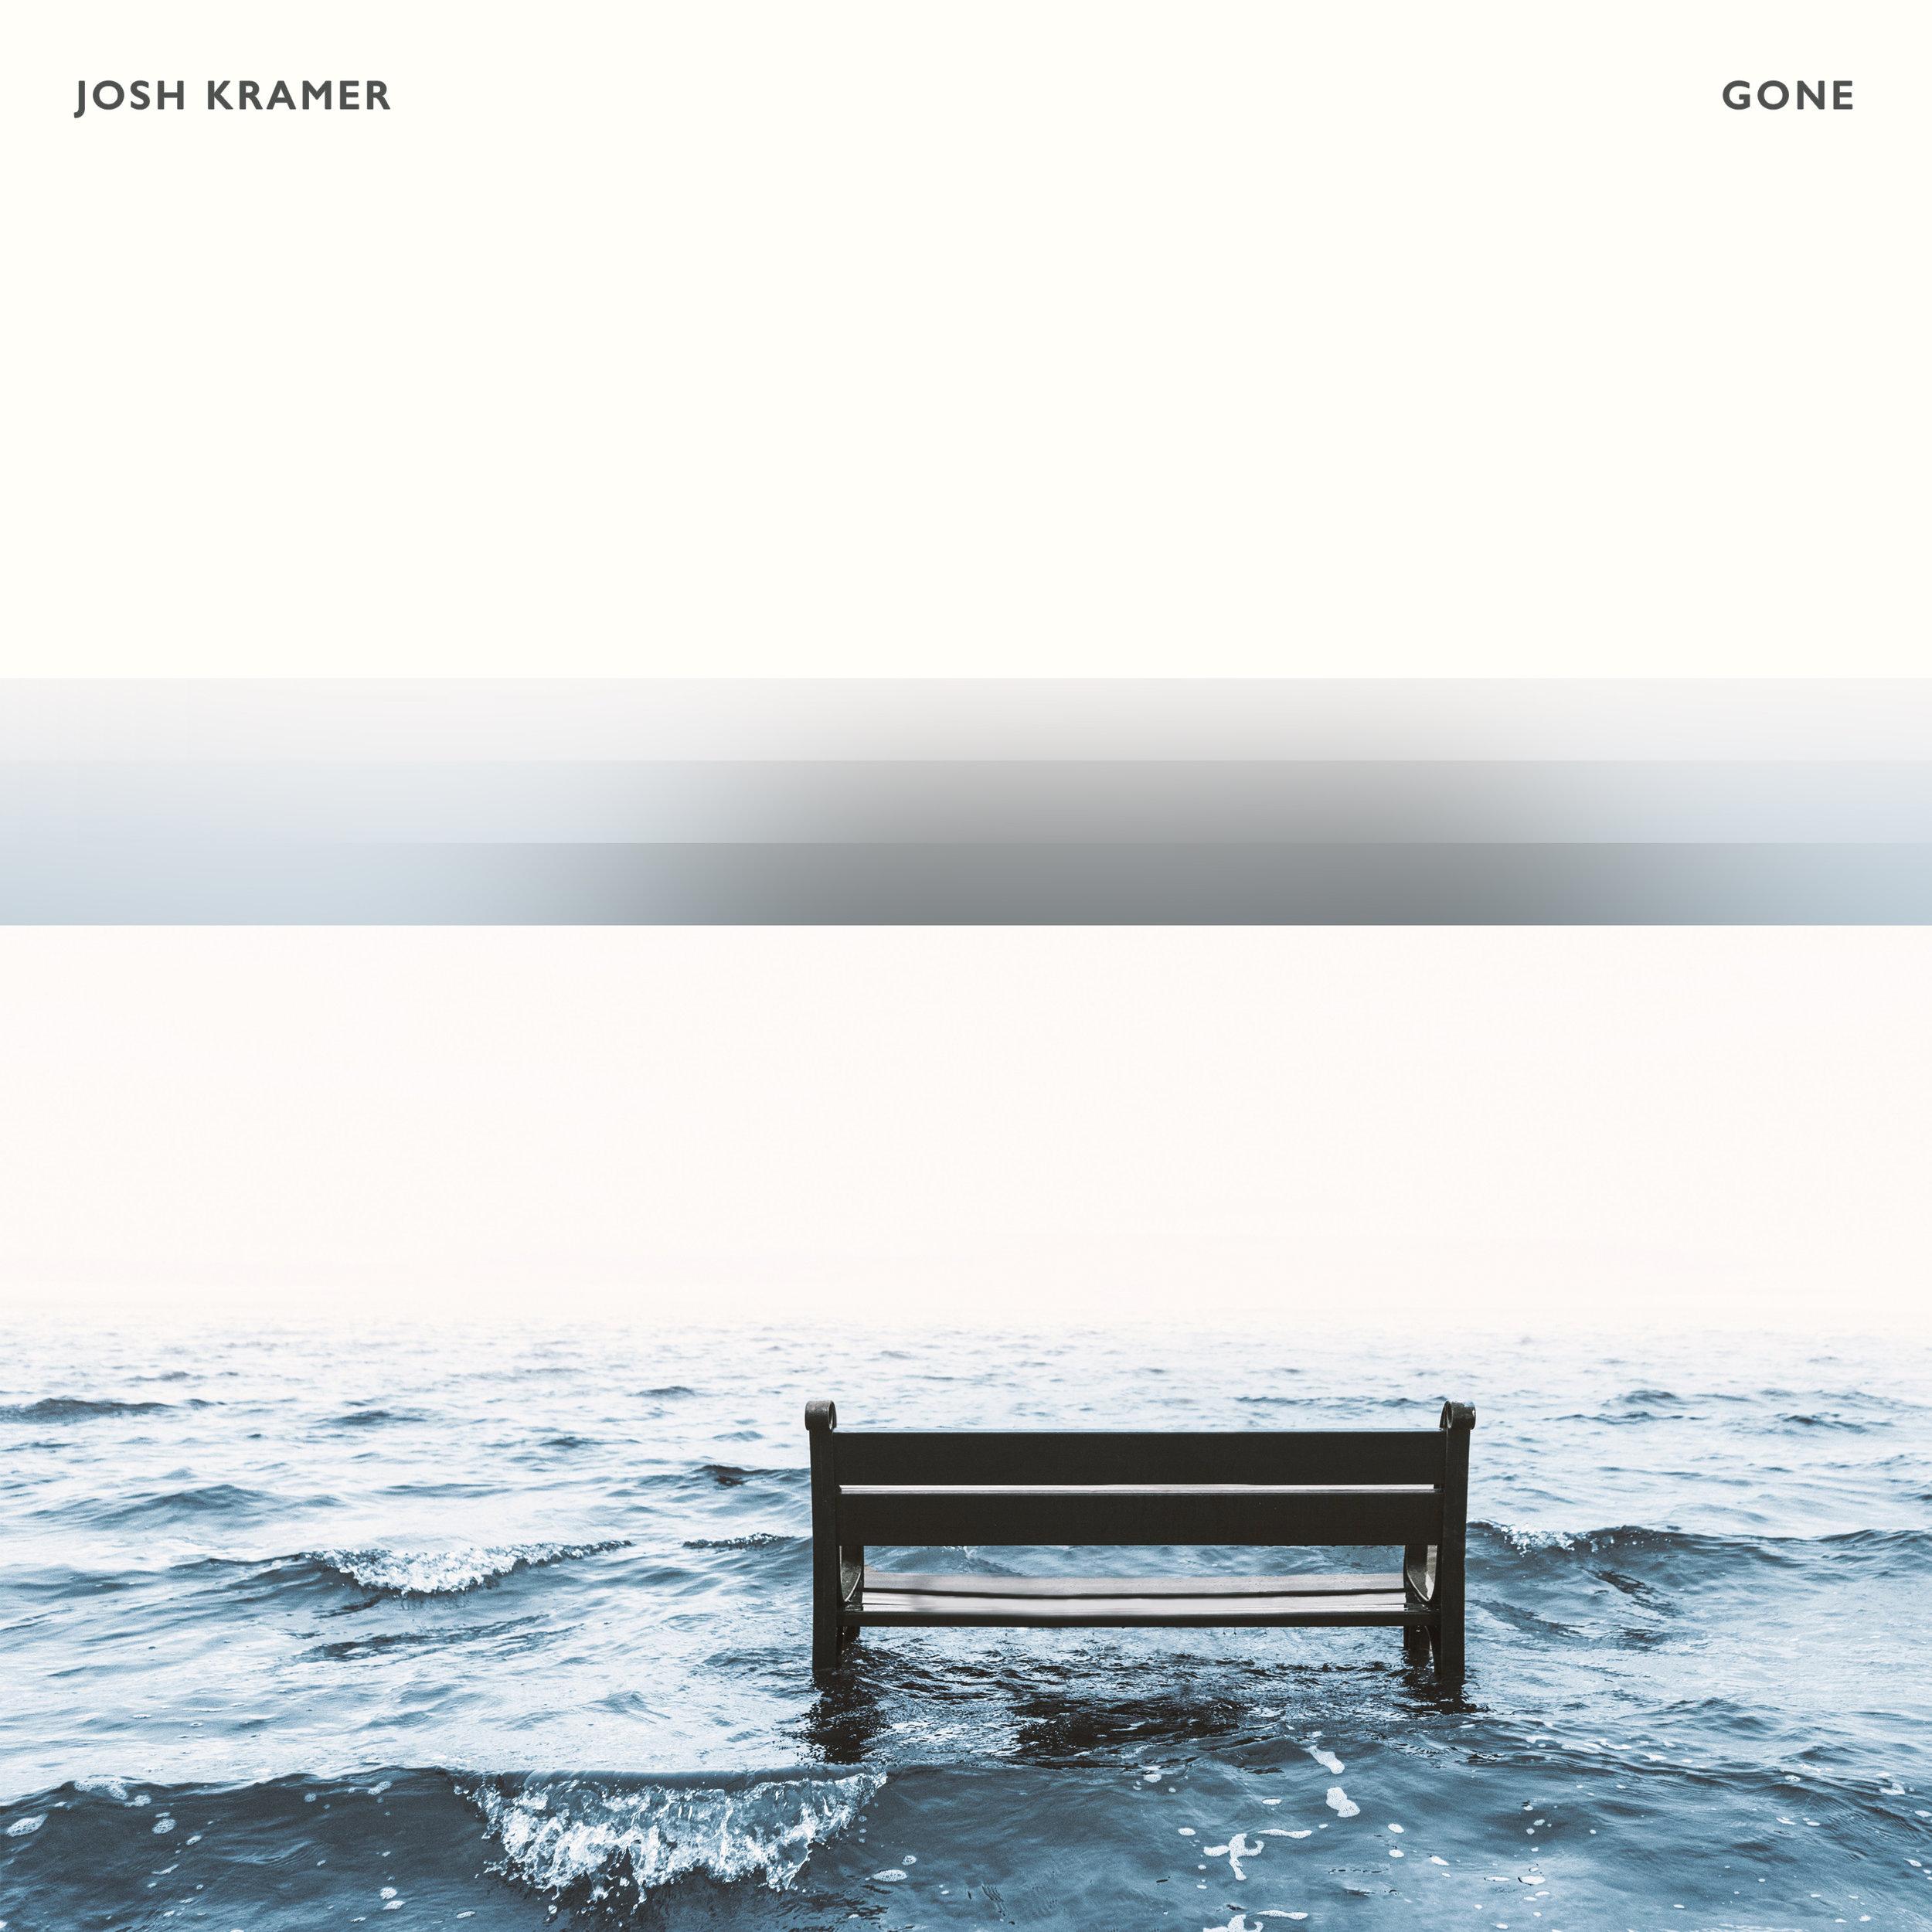 Josh Kramer - Gone